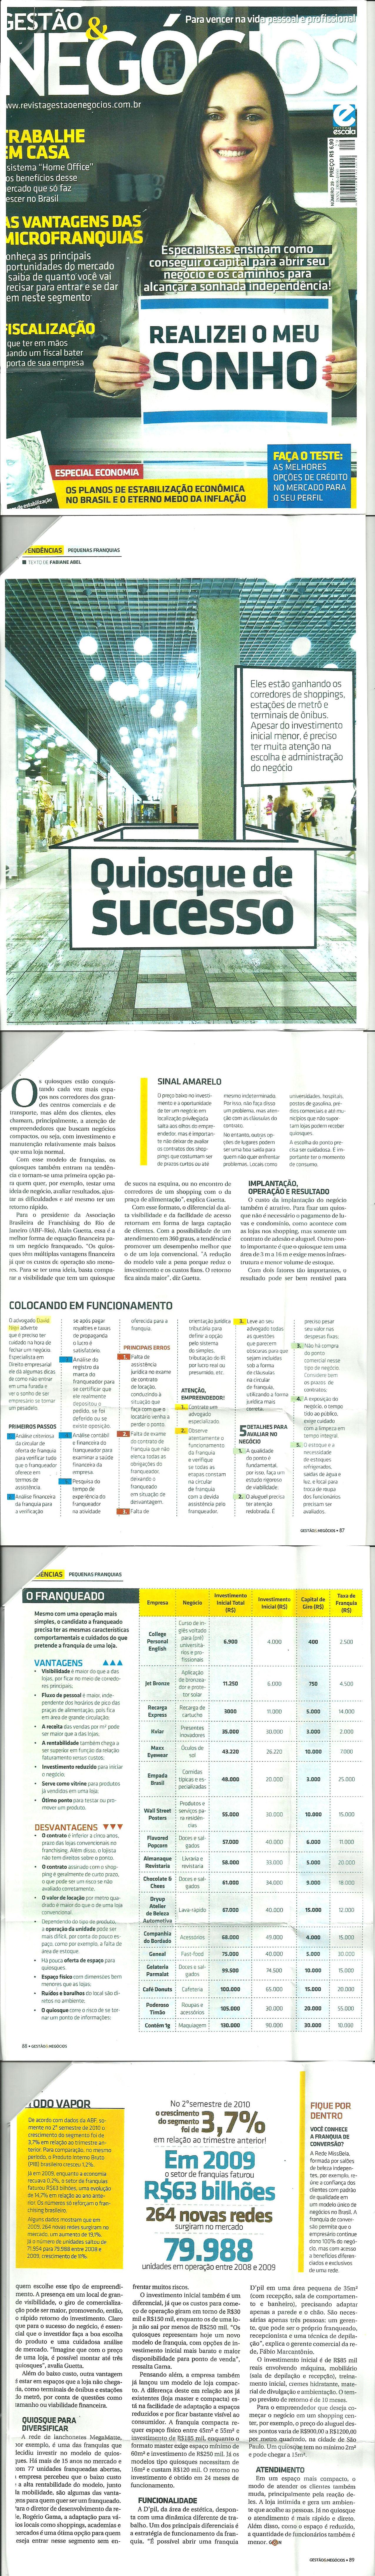 revista-gestao-e-negocios-n290001